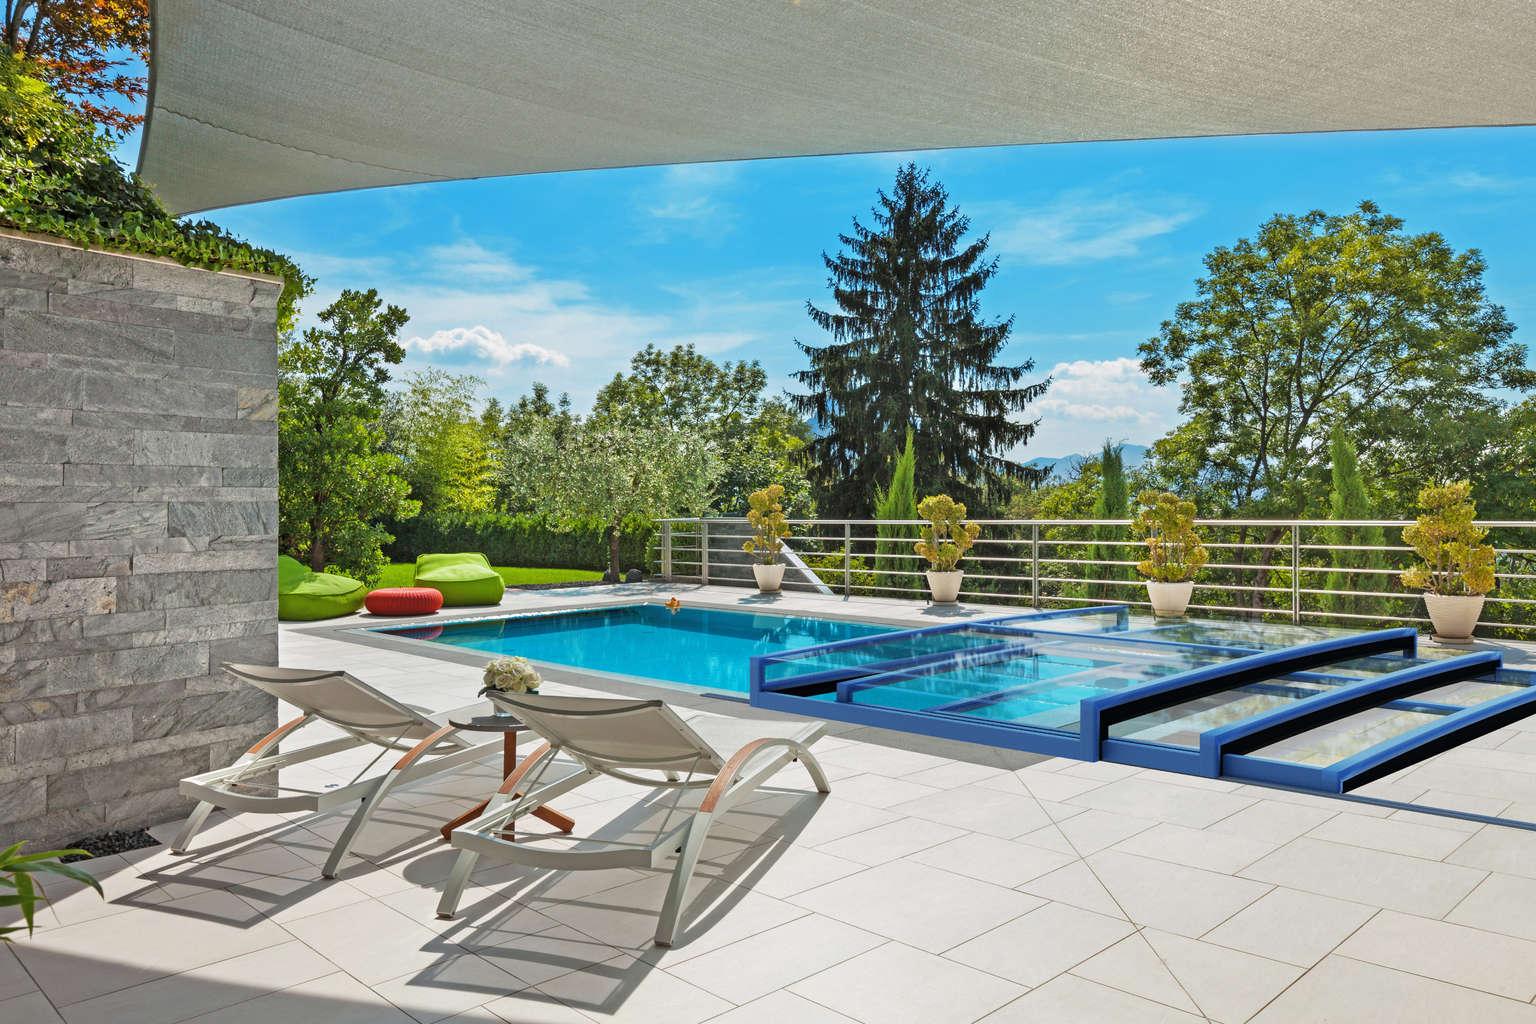 Poolüberdachung fest und fahrbar: Schwimmbadüberdachung